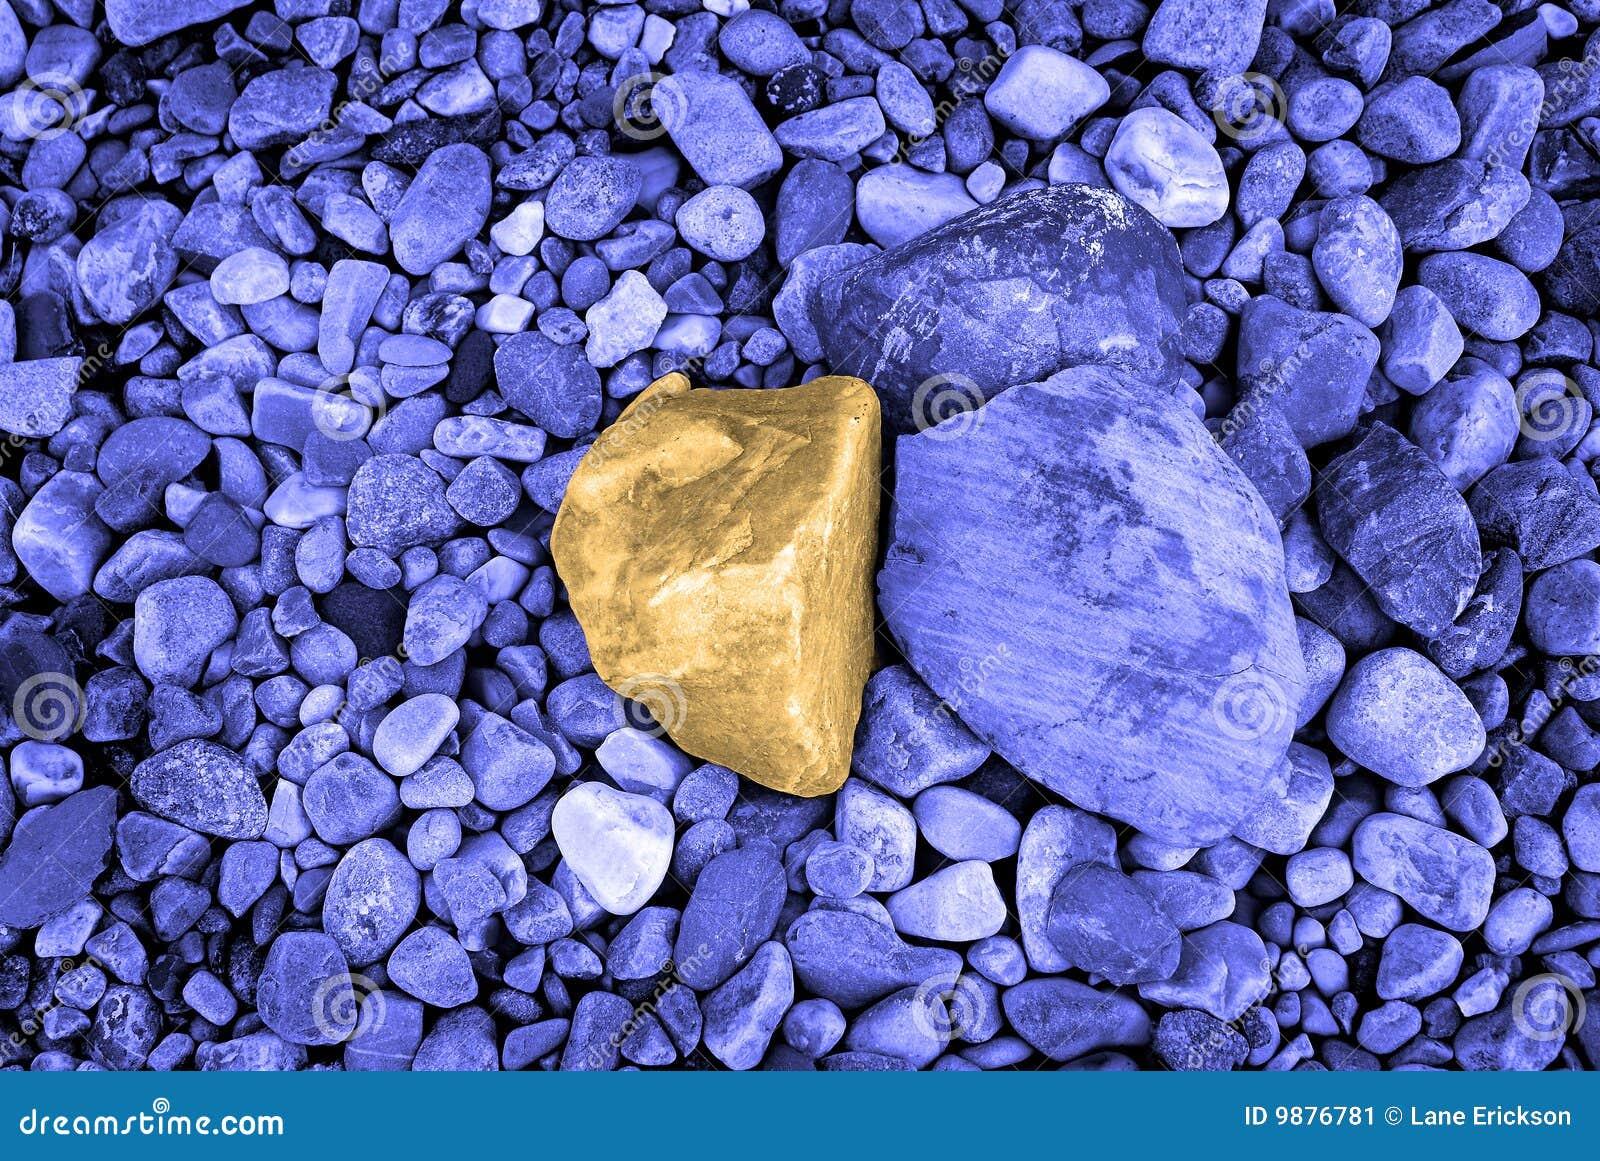 Decorative rocks stock image image 9876781 for Large outdoor decorative rocks